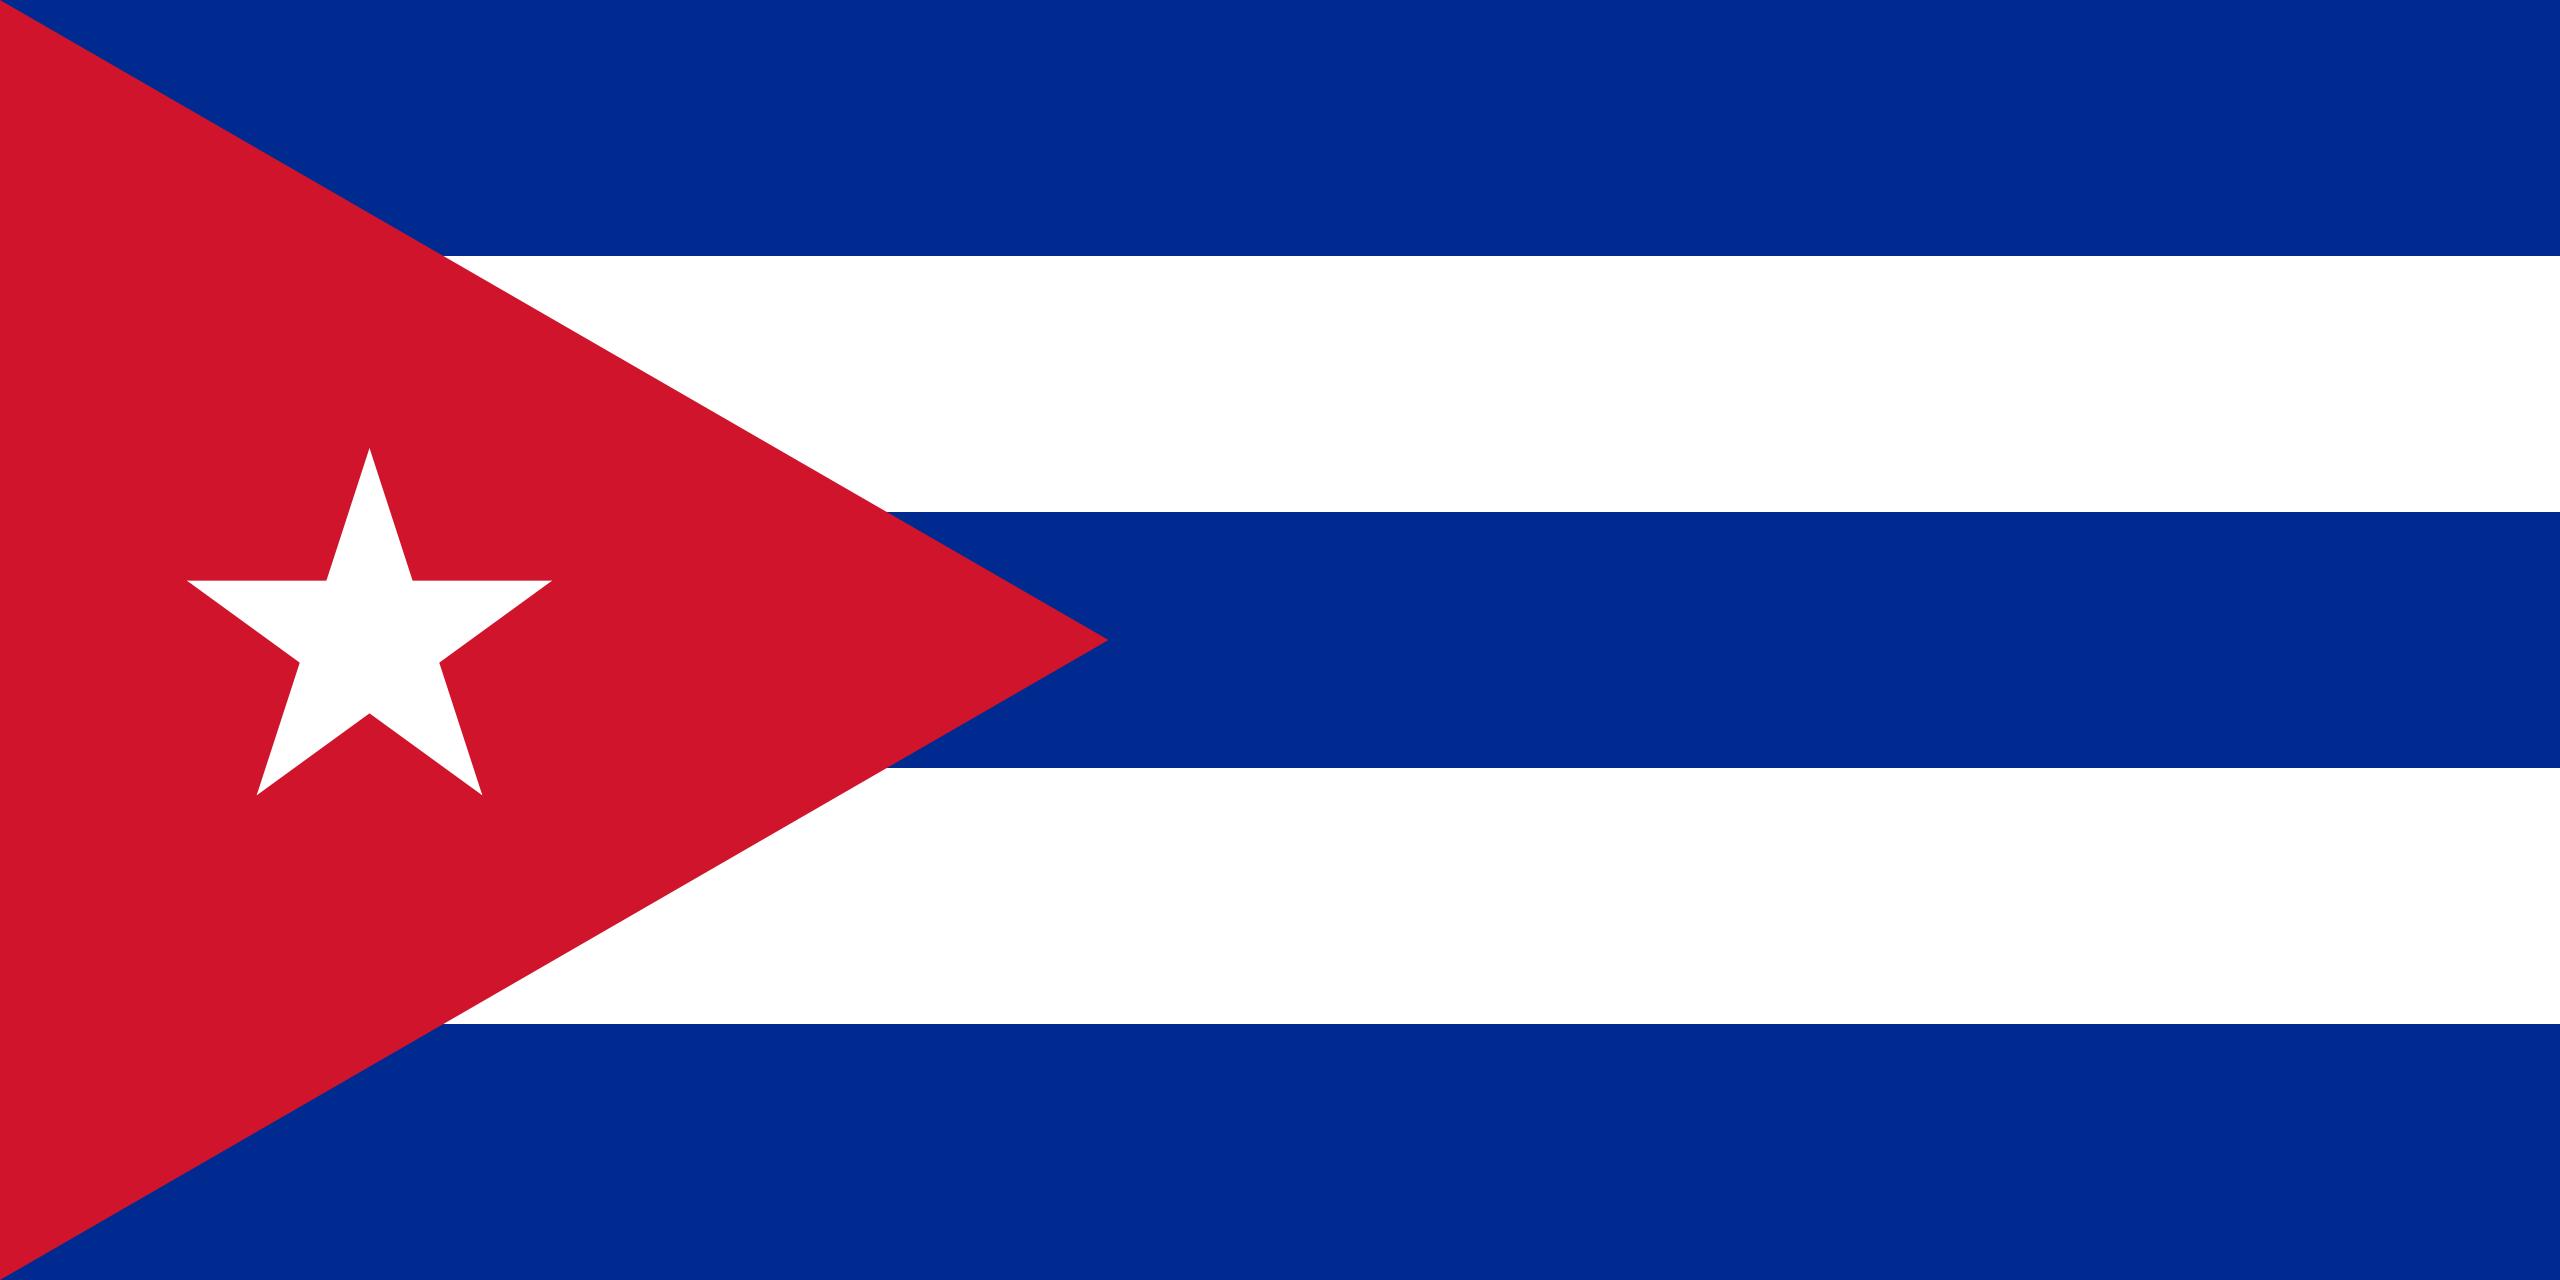 cuba, paese, emblema, logo, simbolo - Sfondi HD - Professor-falken.com